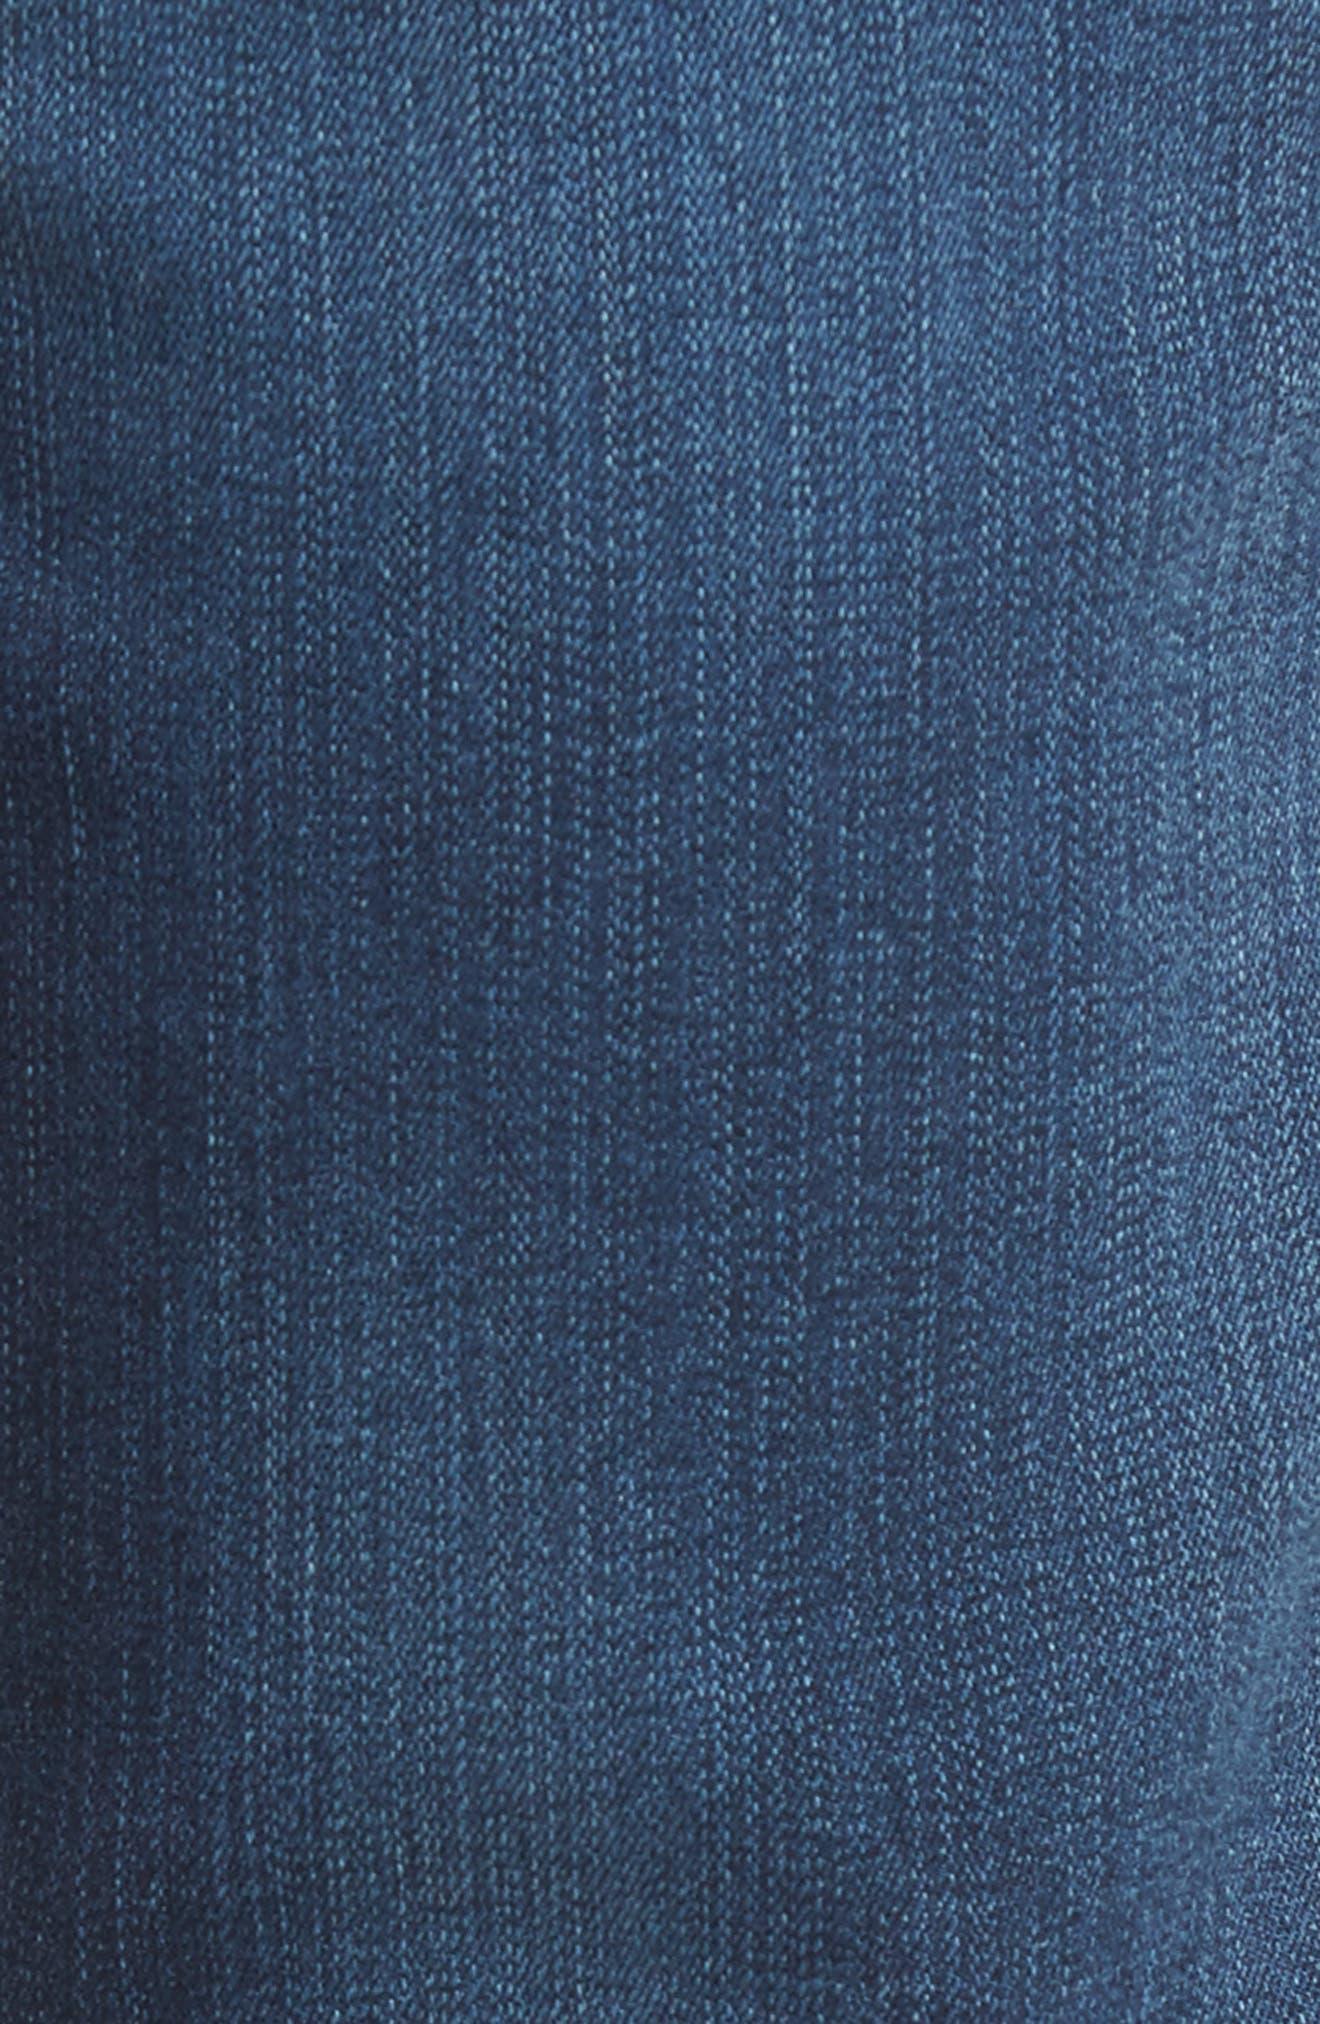 Blake Slim Fit Jeans,                             Alternate thumbnail 16, color,